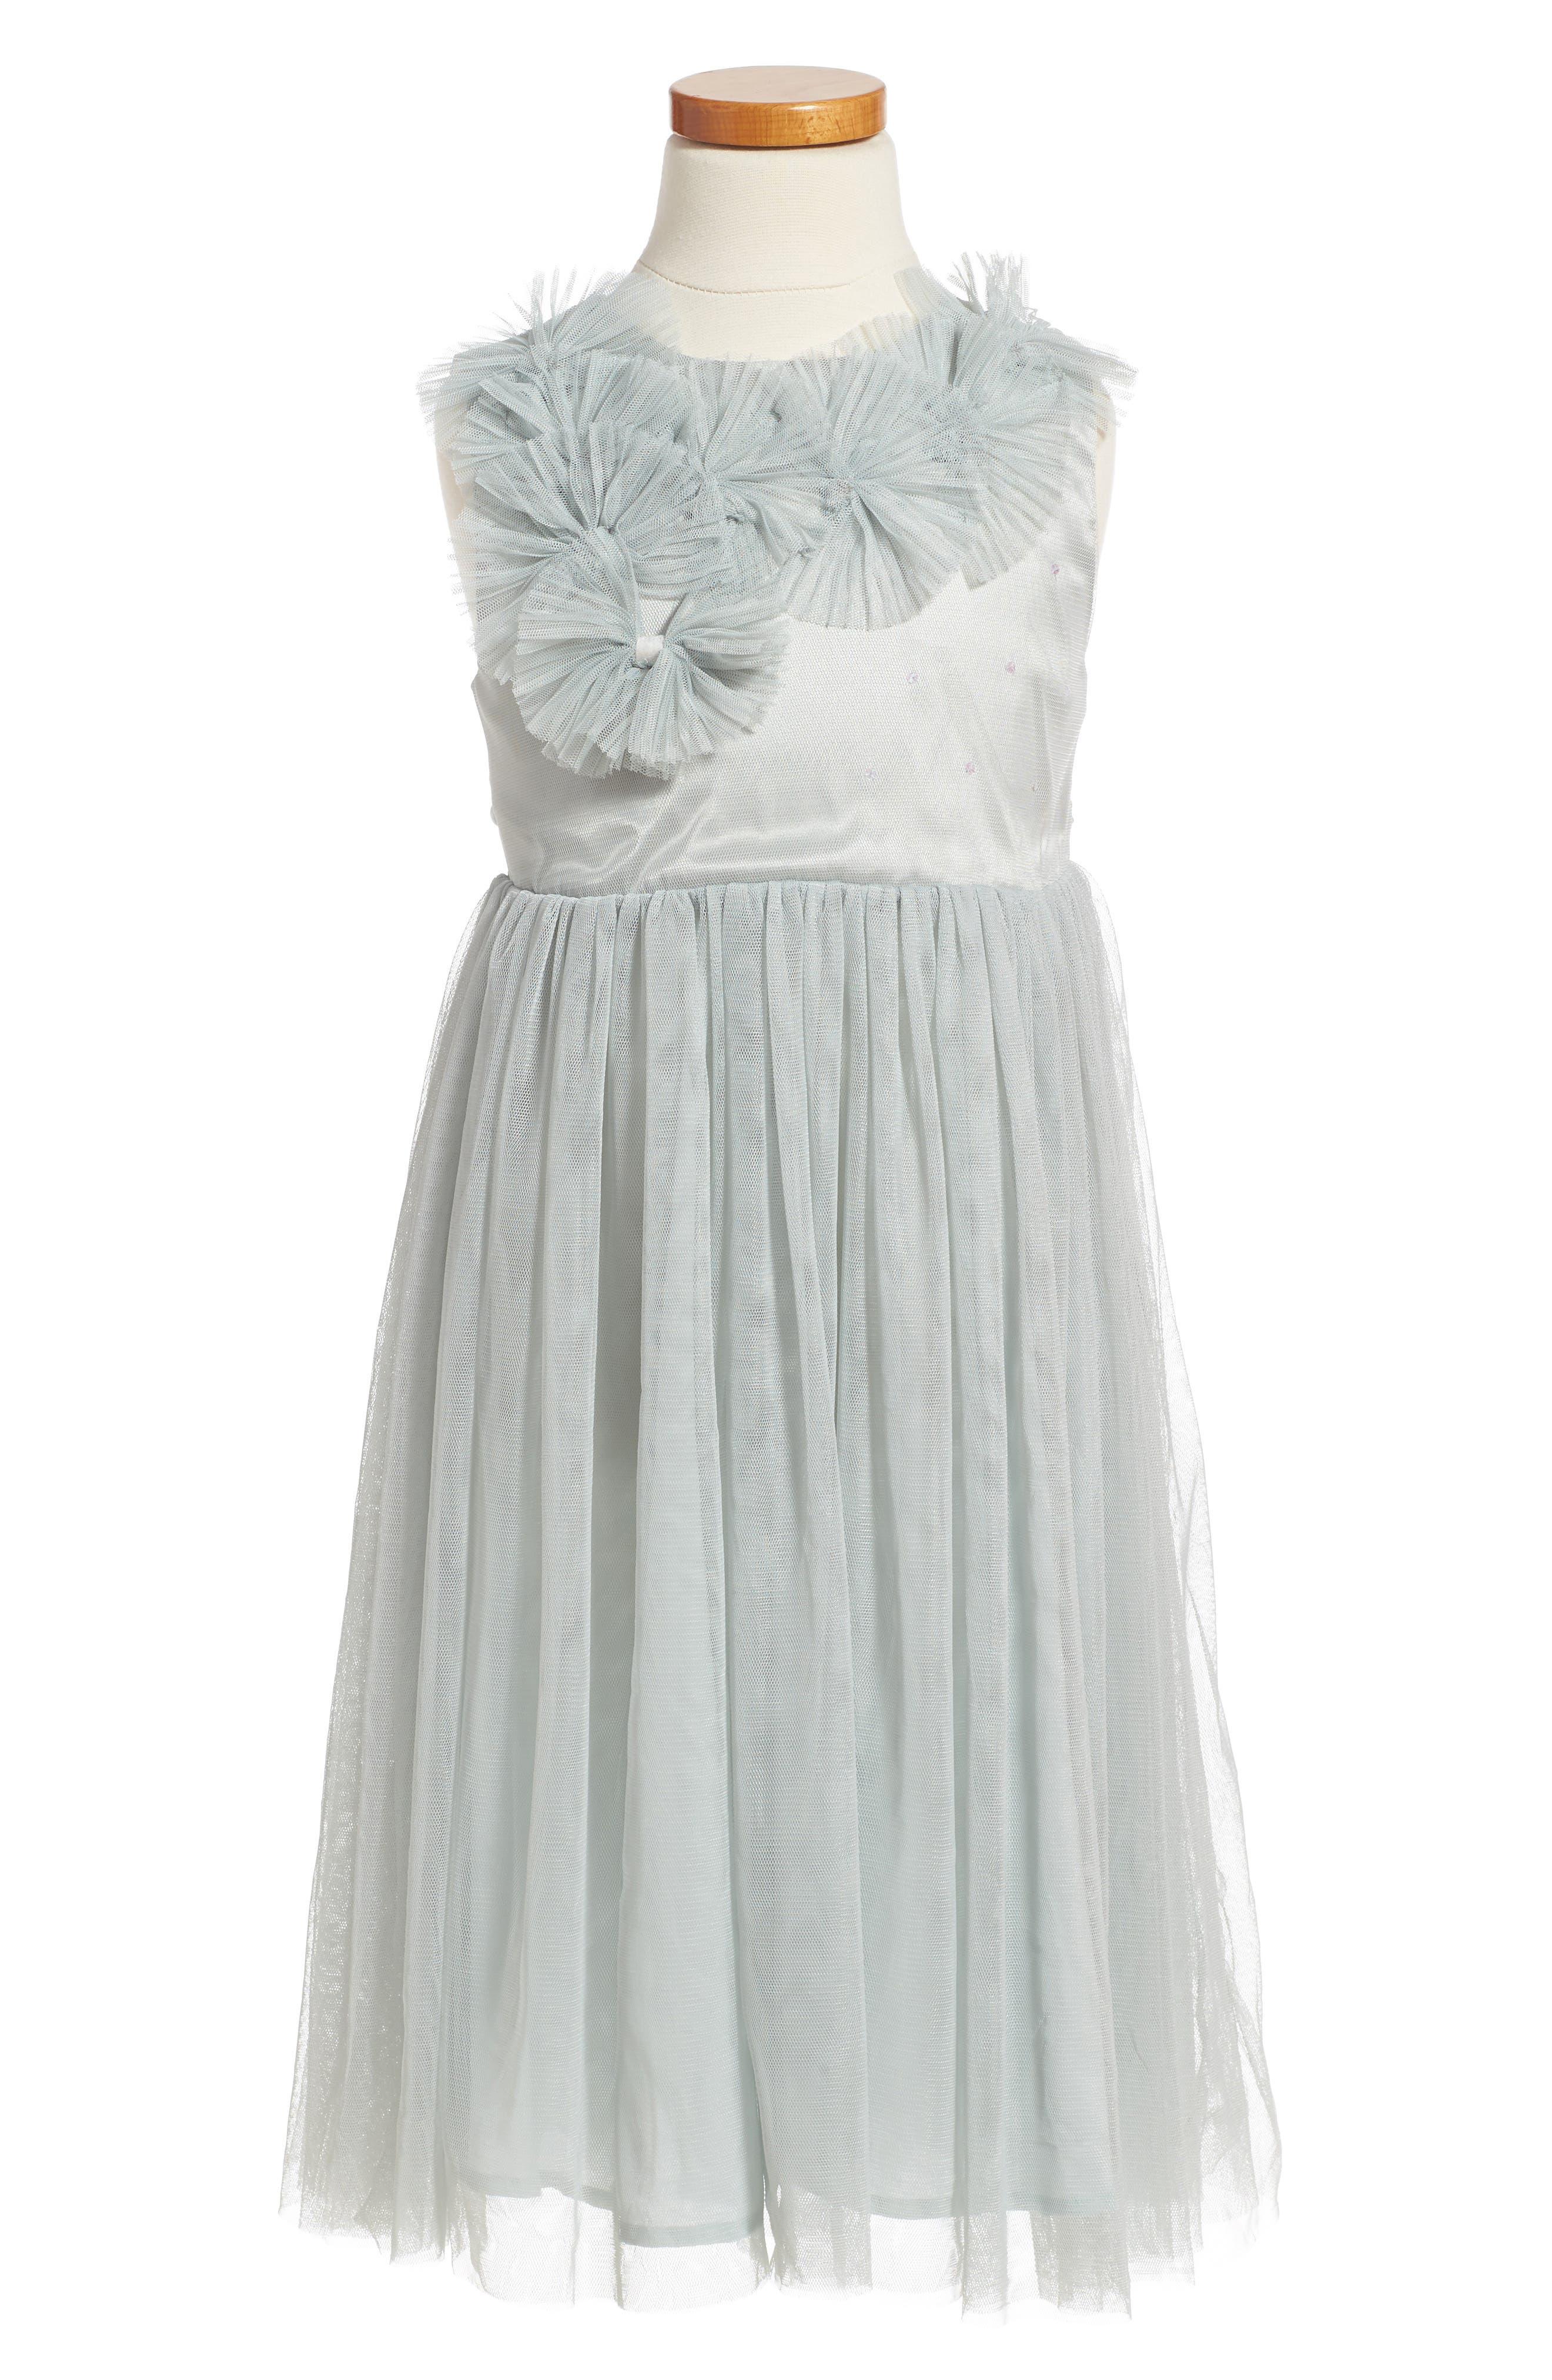 Alternate Image 1 Selected - Popatu Sleeveless Tulle Dress (Toddler Girls, Little Girls & Big Girls)